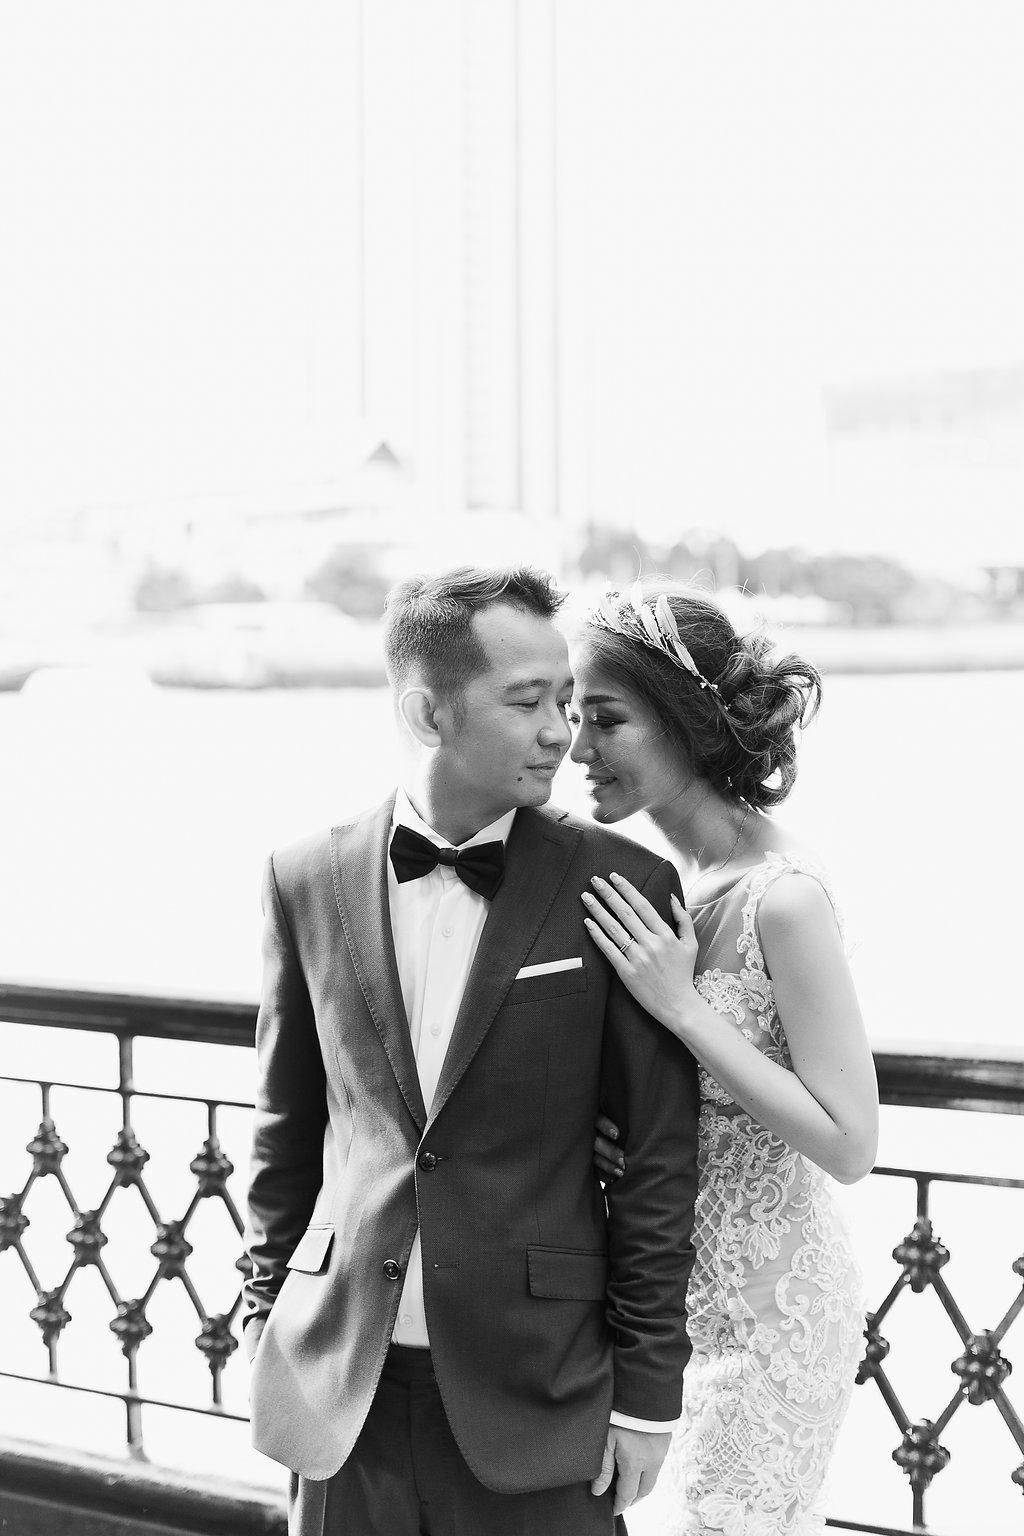 Luxe destination wedding in Jakarta and Bankok   fine art film wedding photographer Tanja Kibogo 5005.JPG